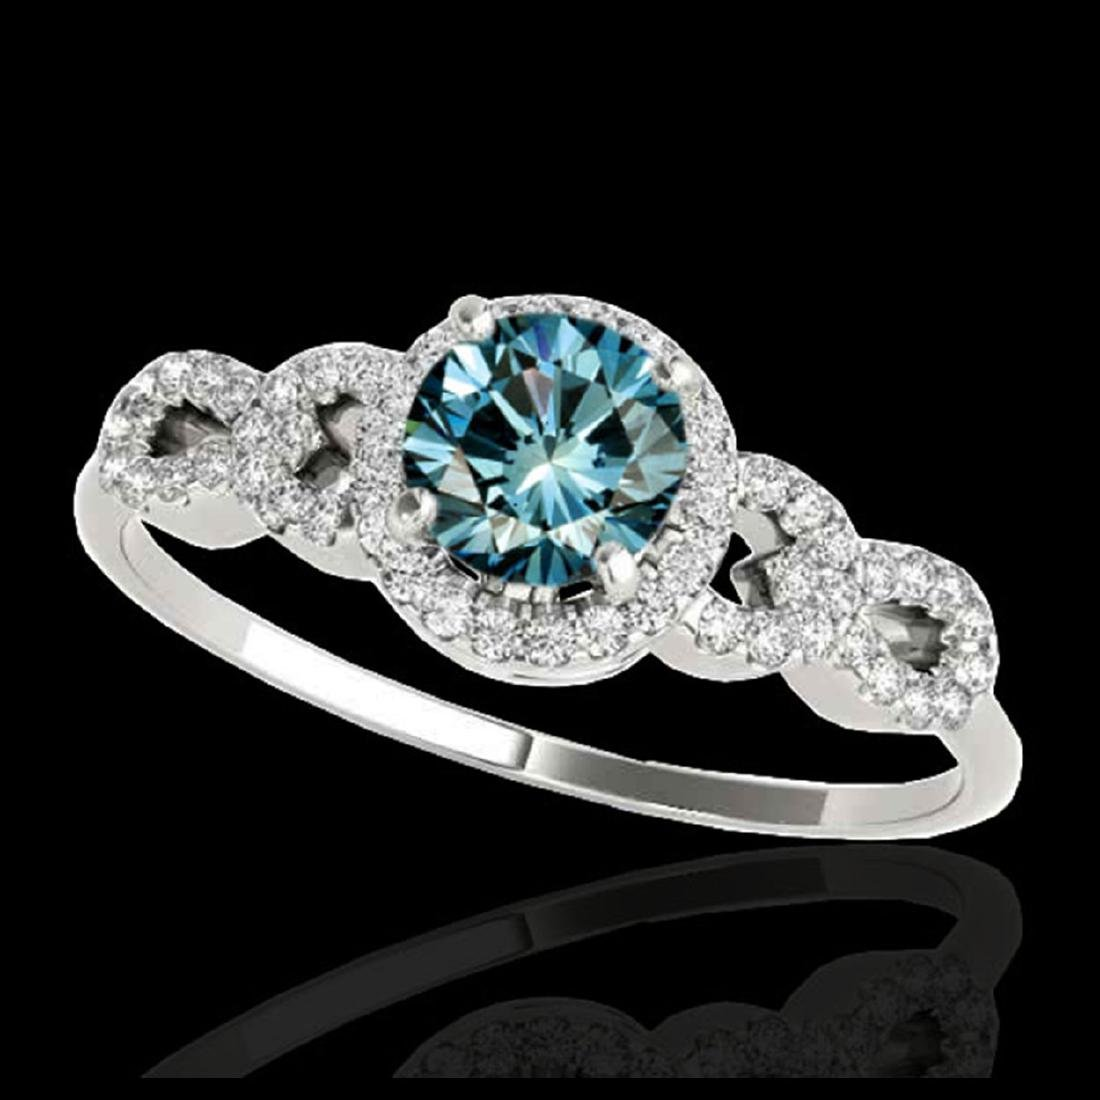 1.33 ctw SI Fancy Blue Diamond Solitaire Ring 10K White